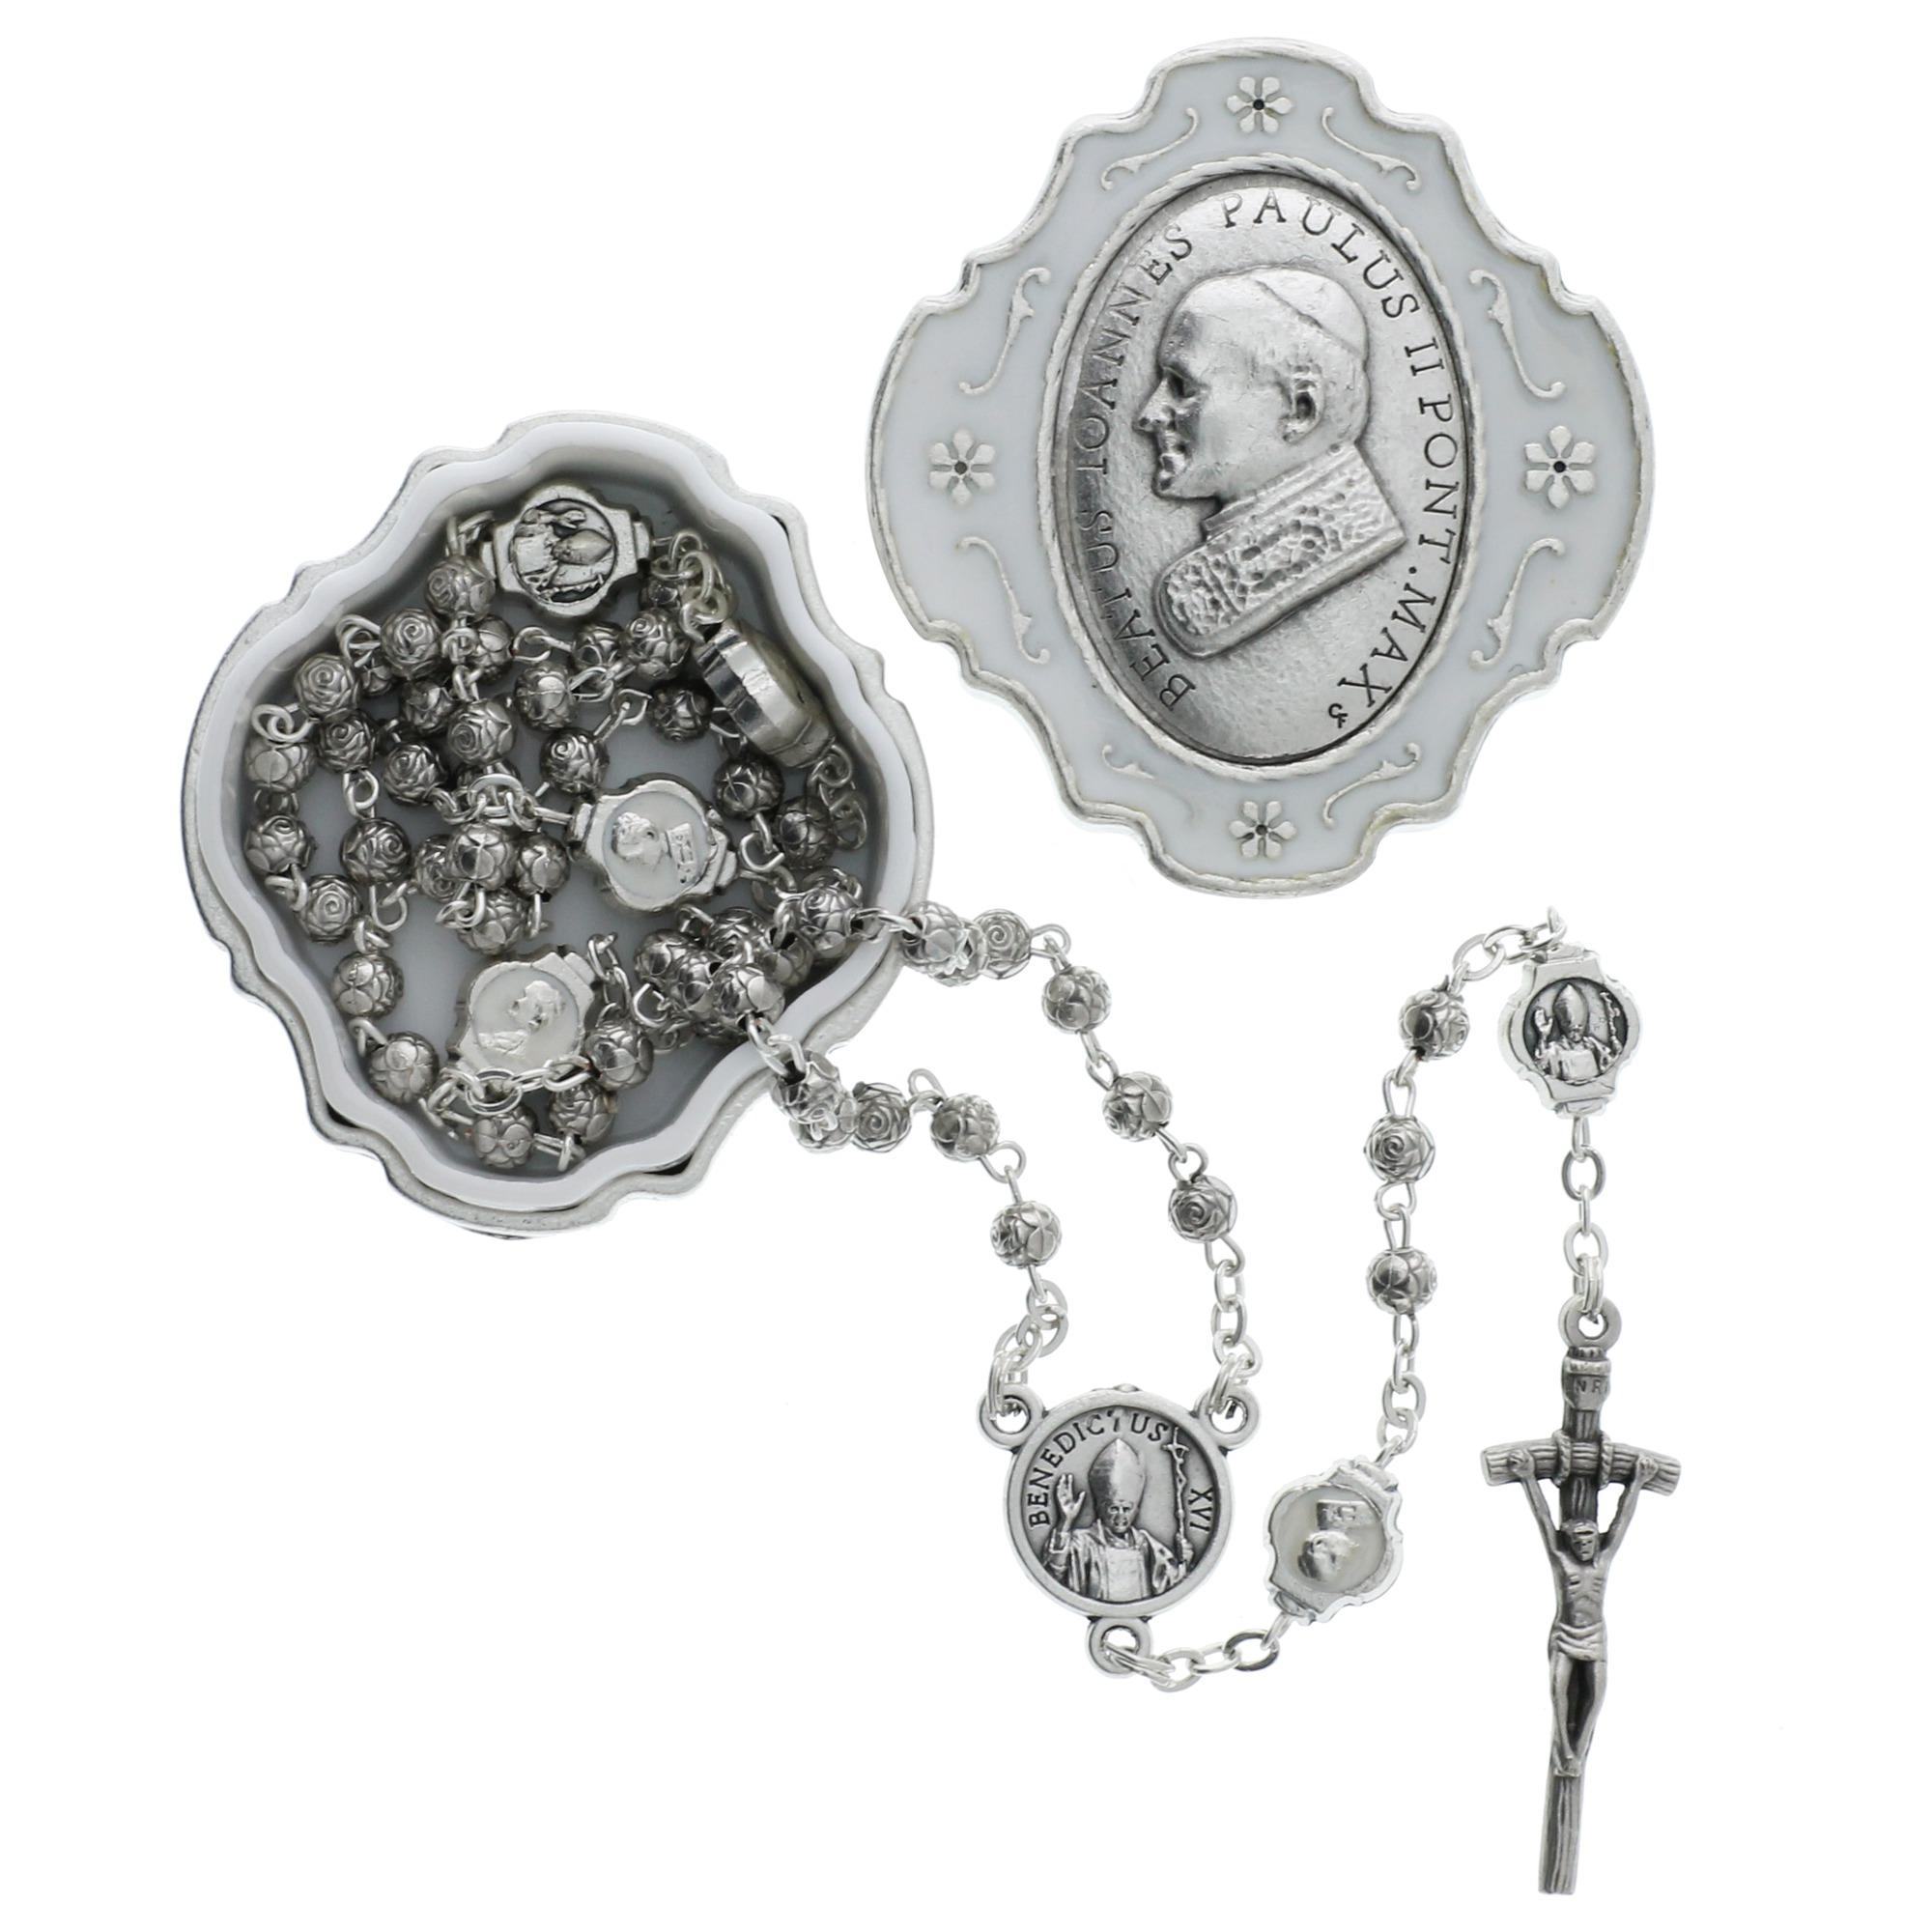 Pope John Paul II Rosary box with Rosary